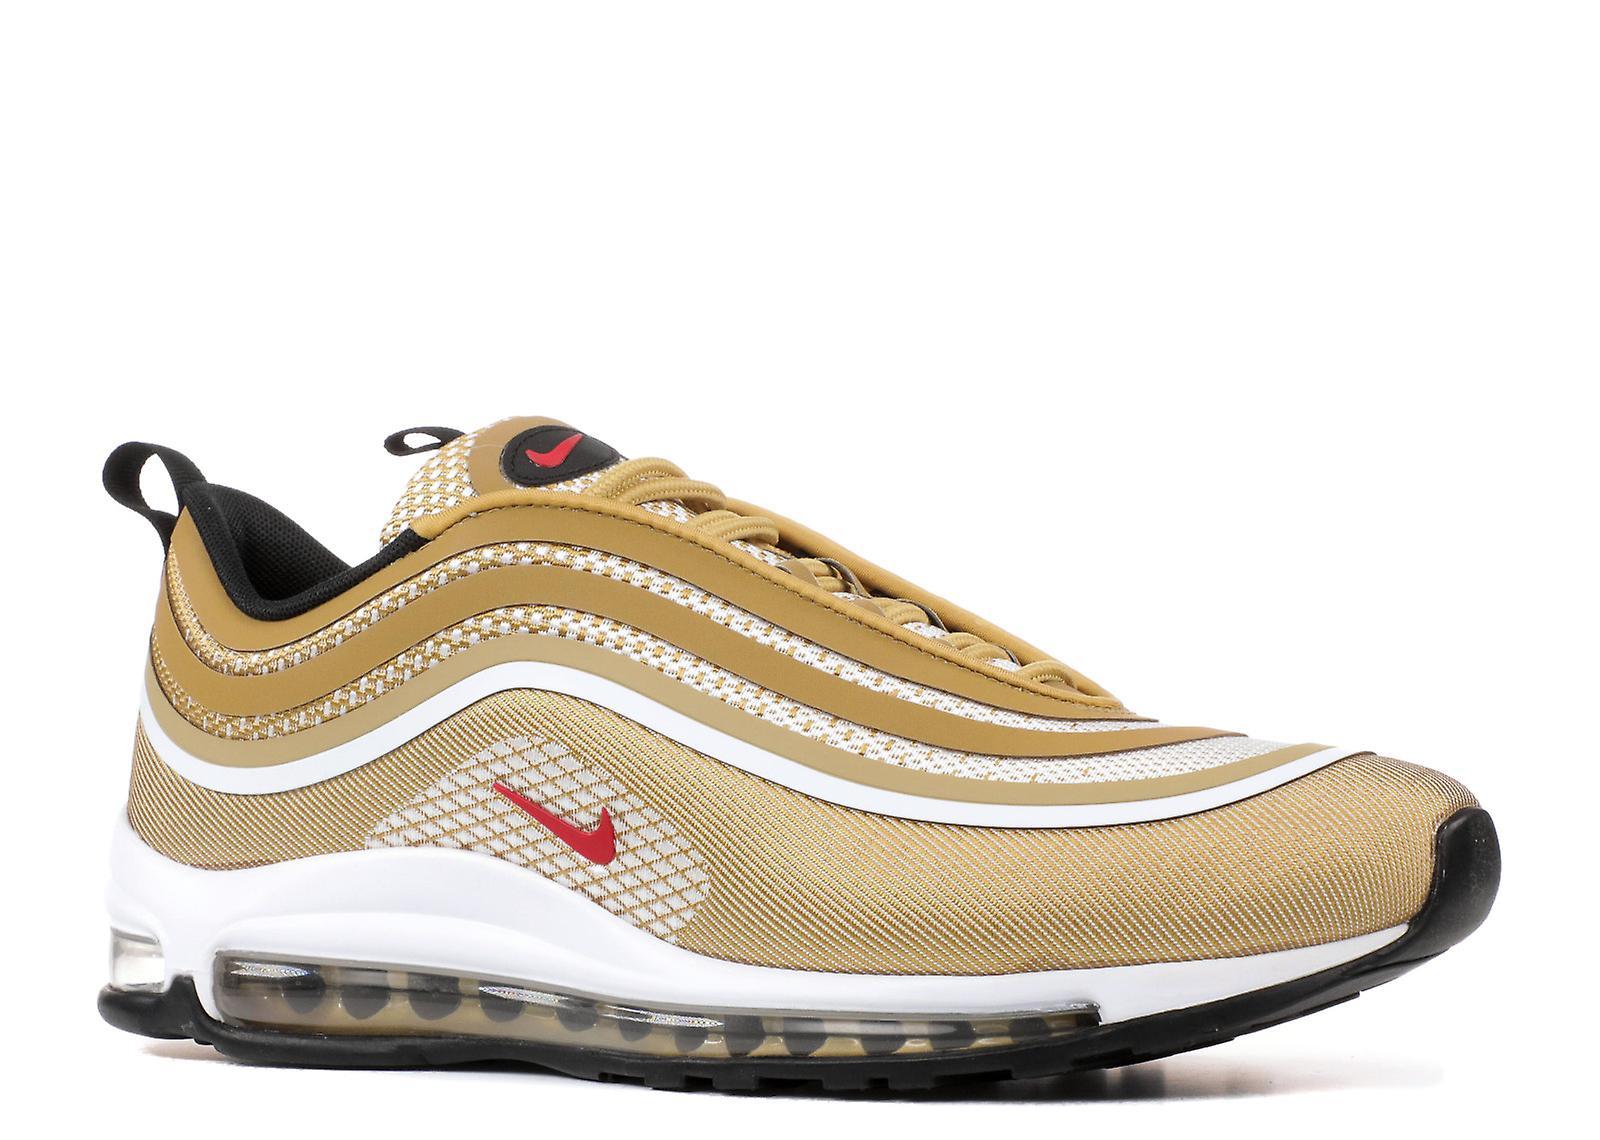 Air Max 97 Ul& 039; 17 - 918356 - 700 - chaussures